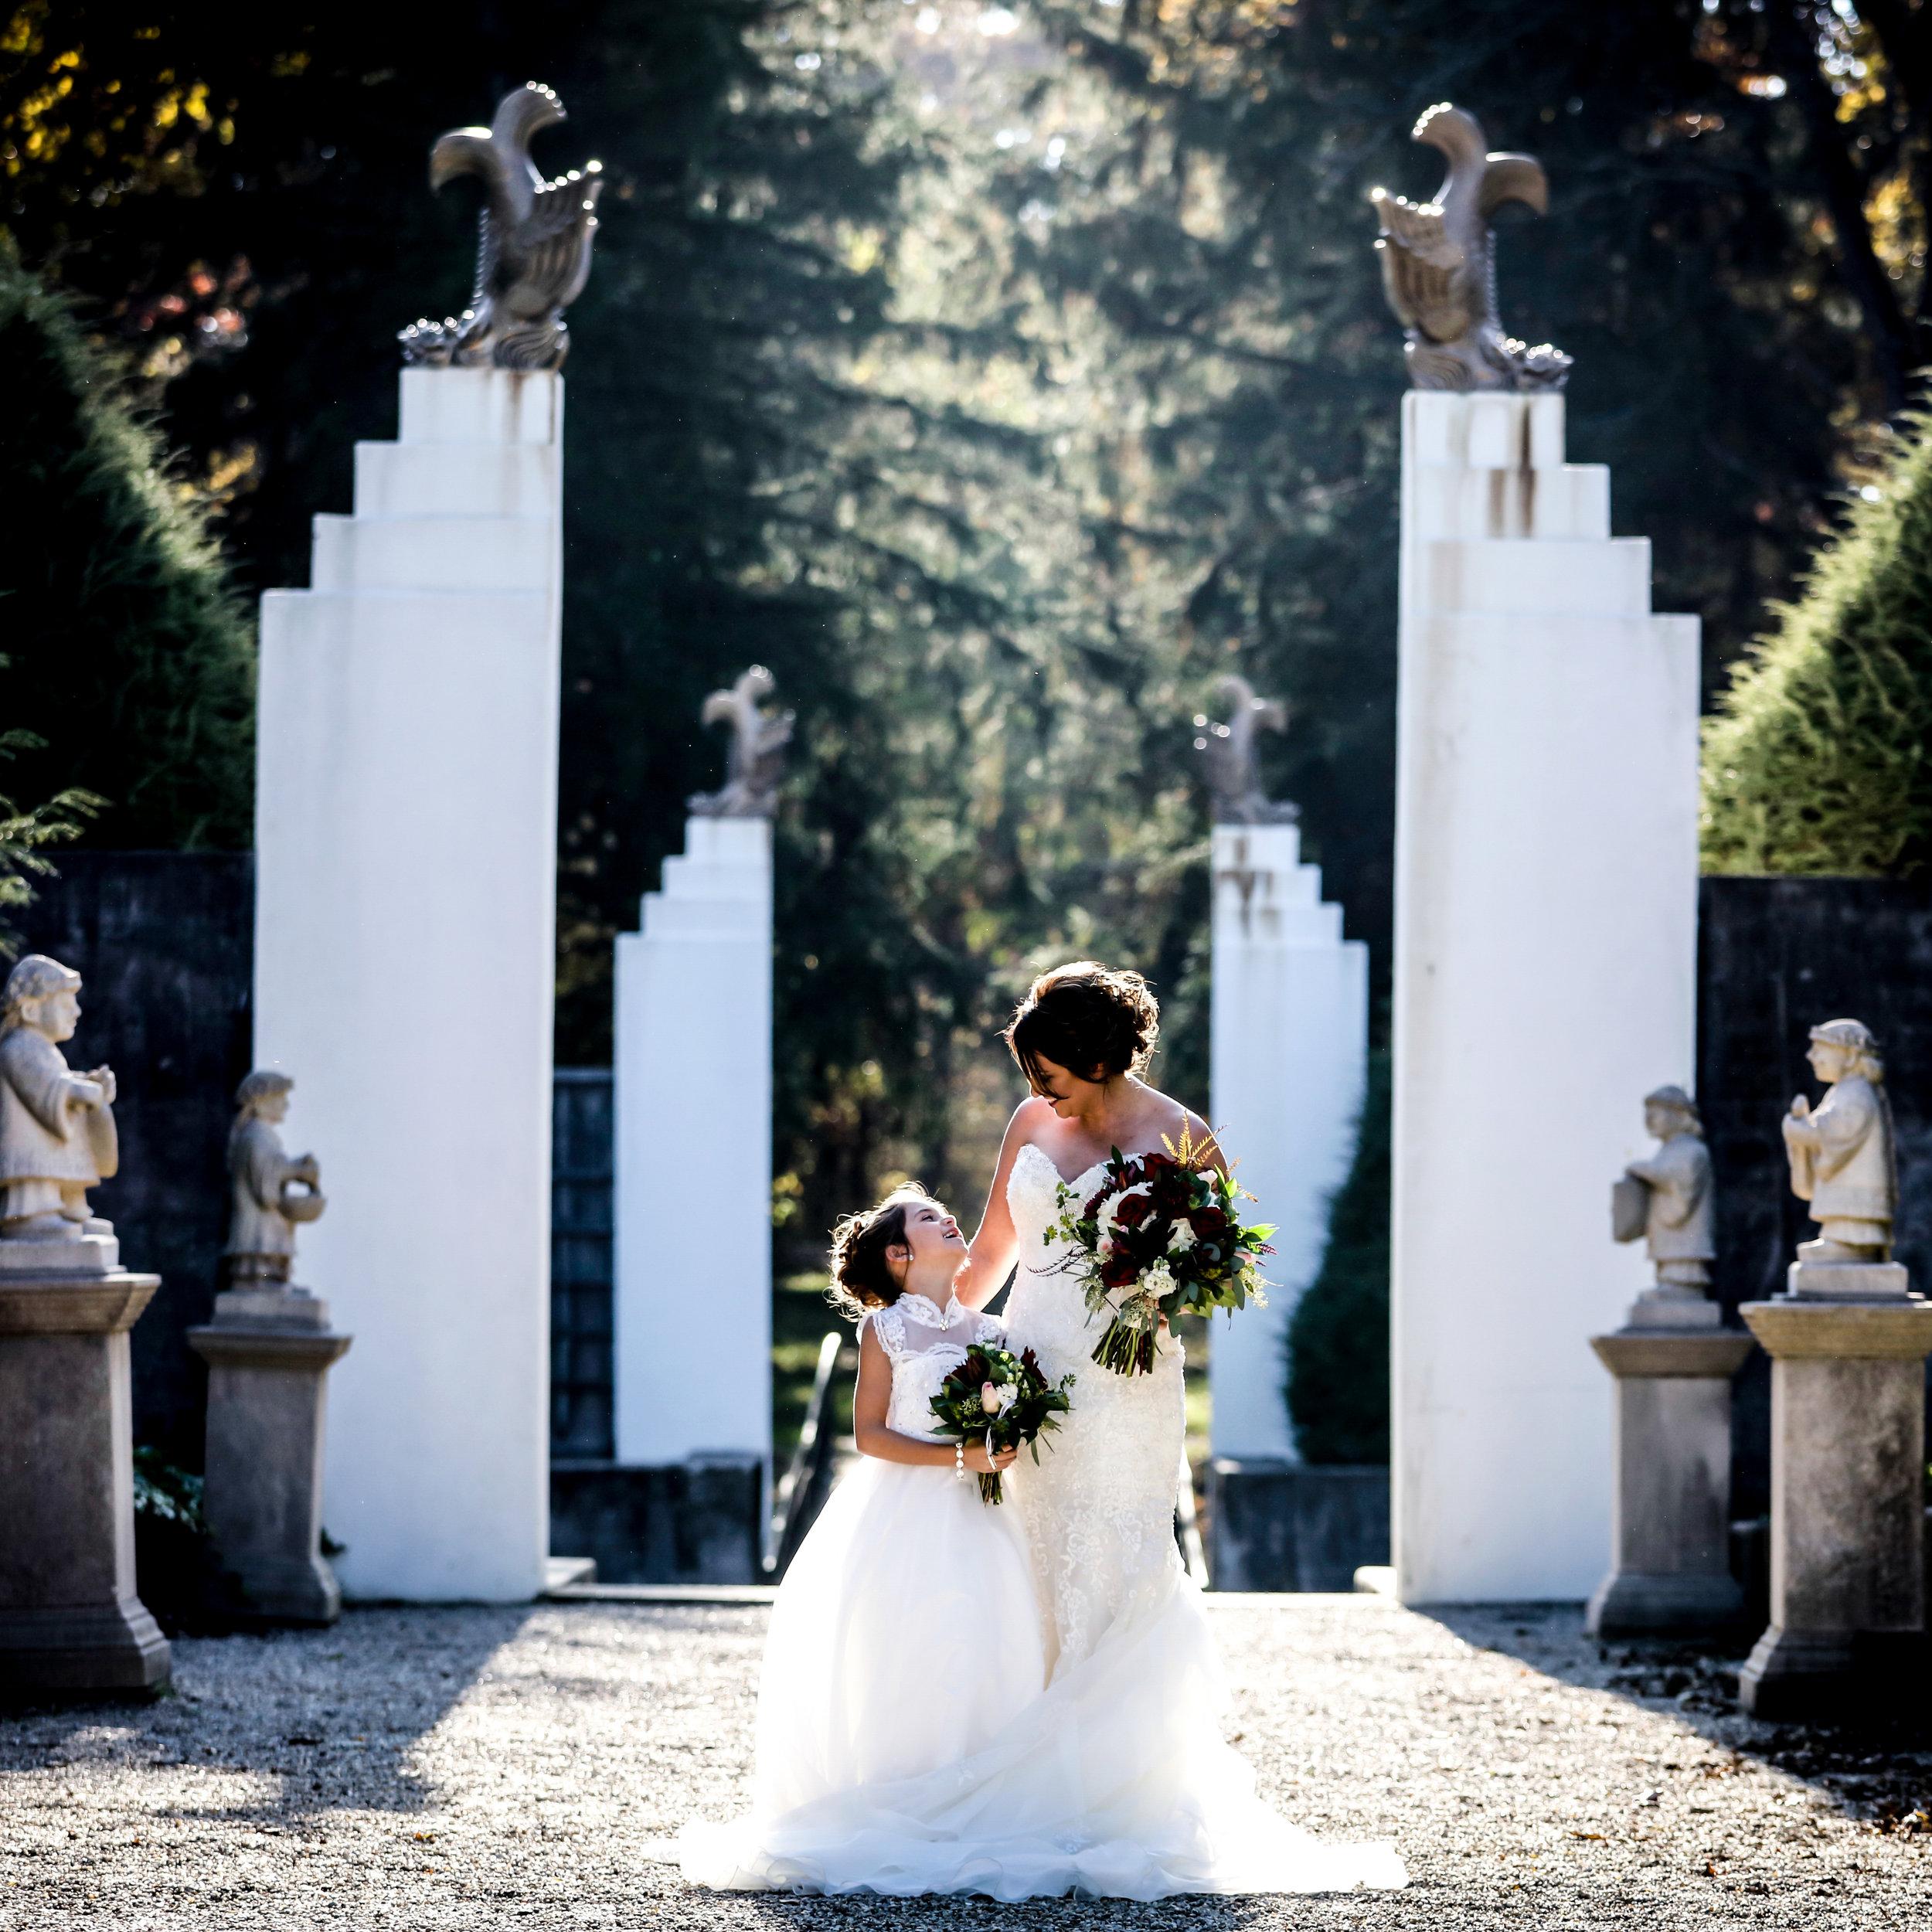 WeddingWebsite-61.jpg